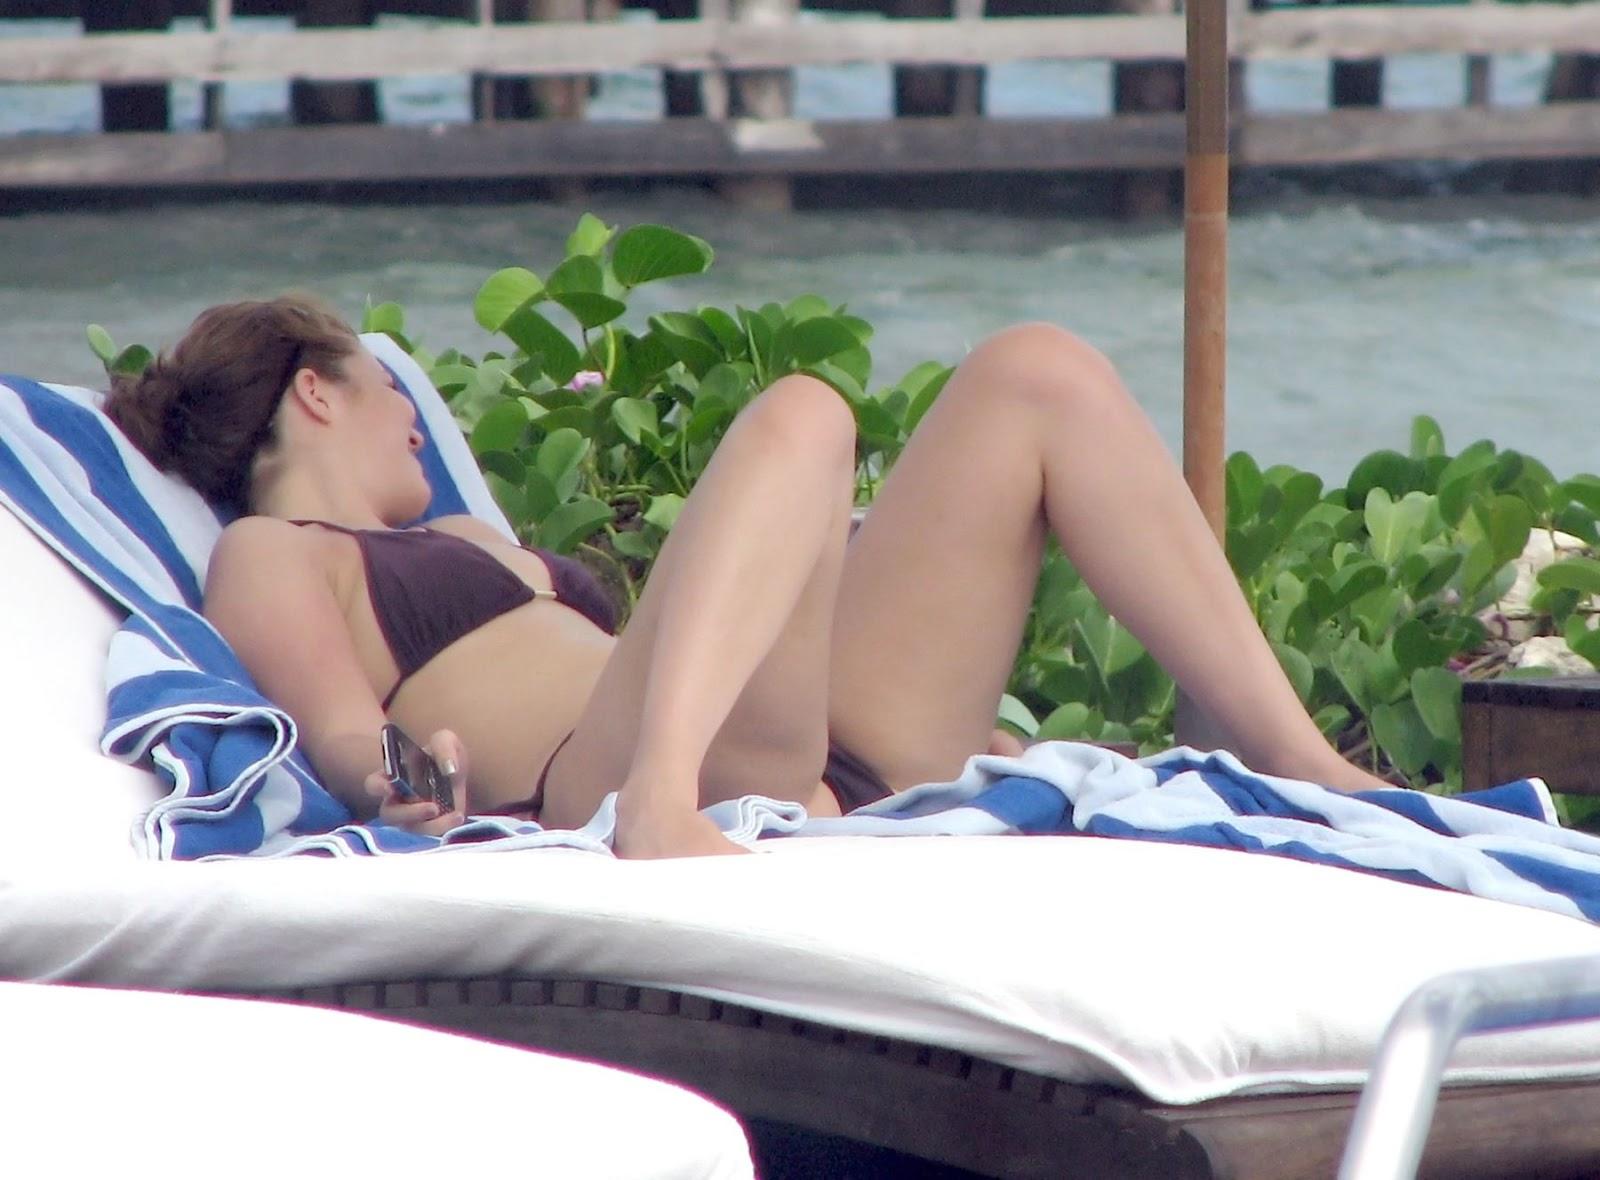 Bikini mandy moore pic